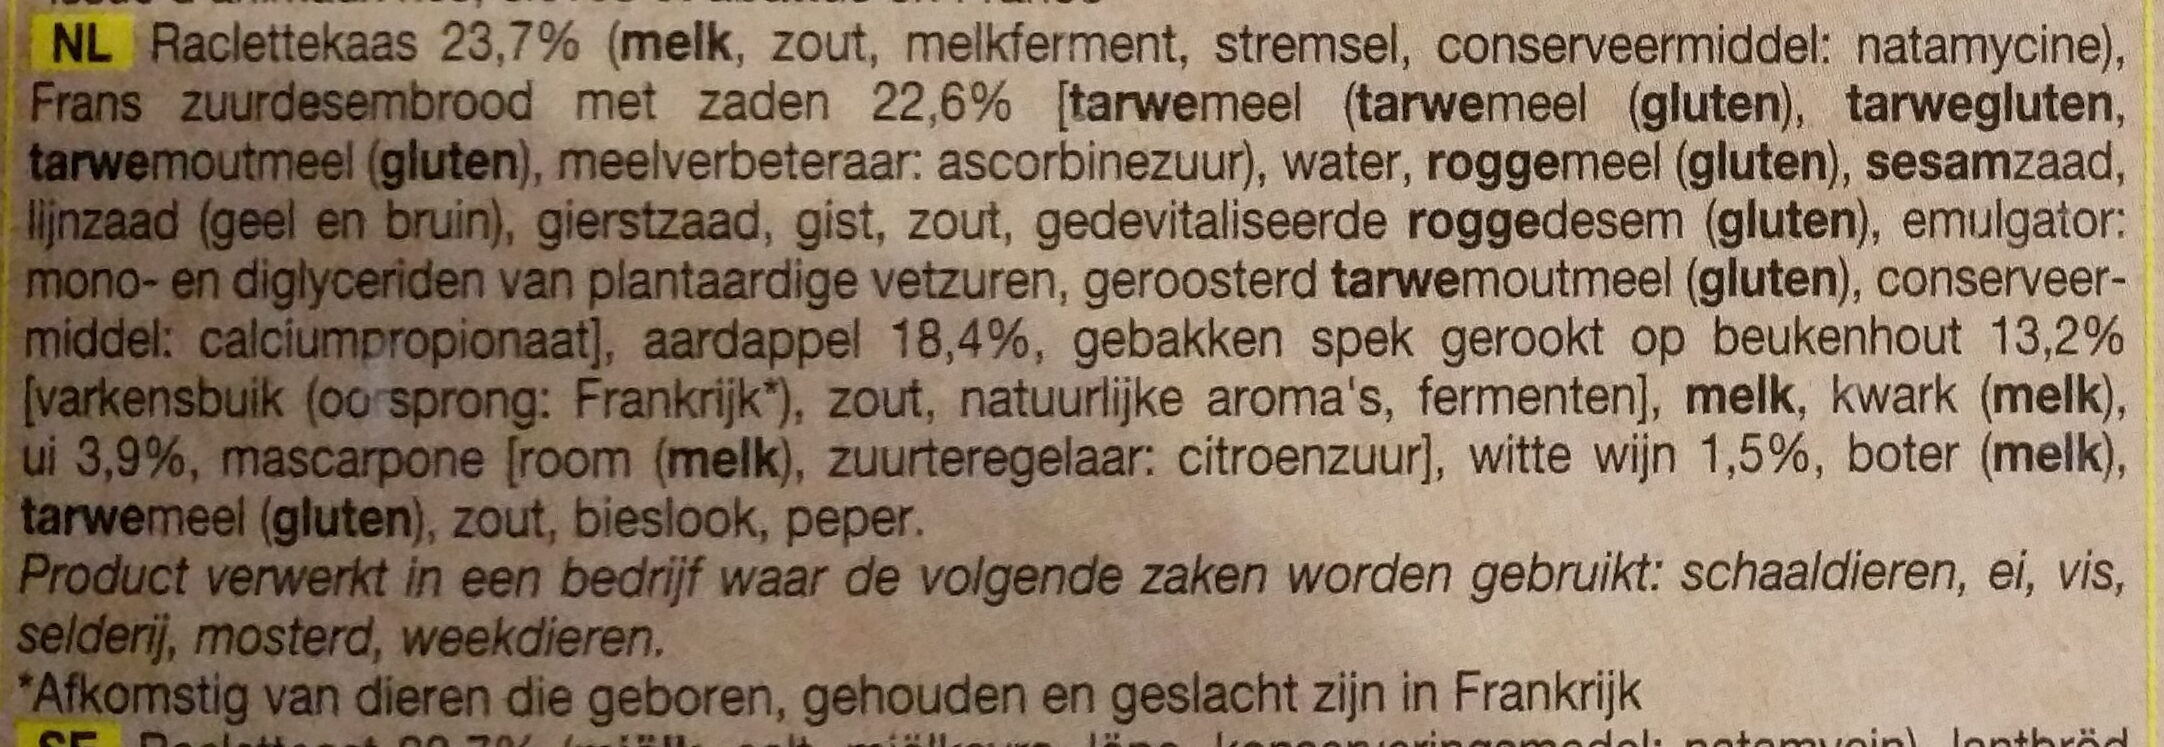 Tartine a la montagnarde - Ingrediënten - nl